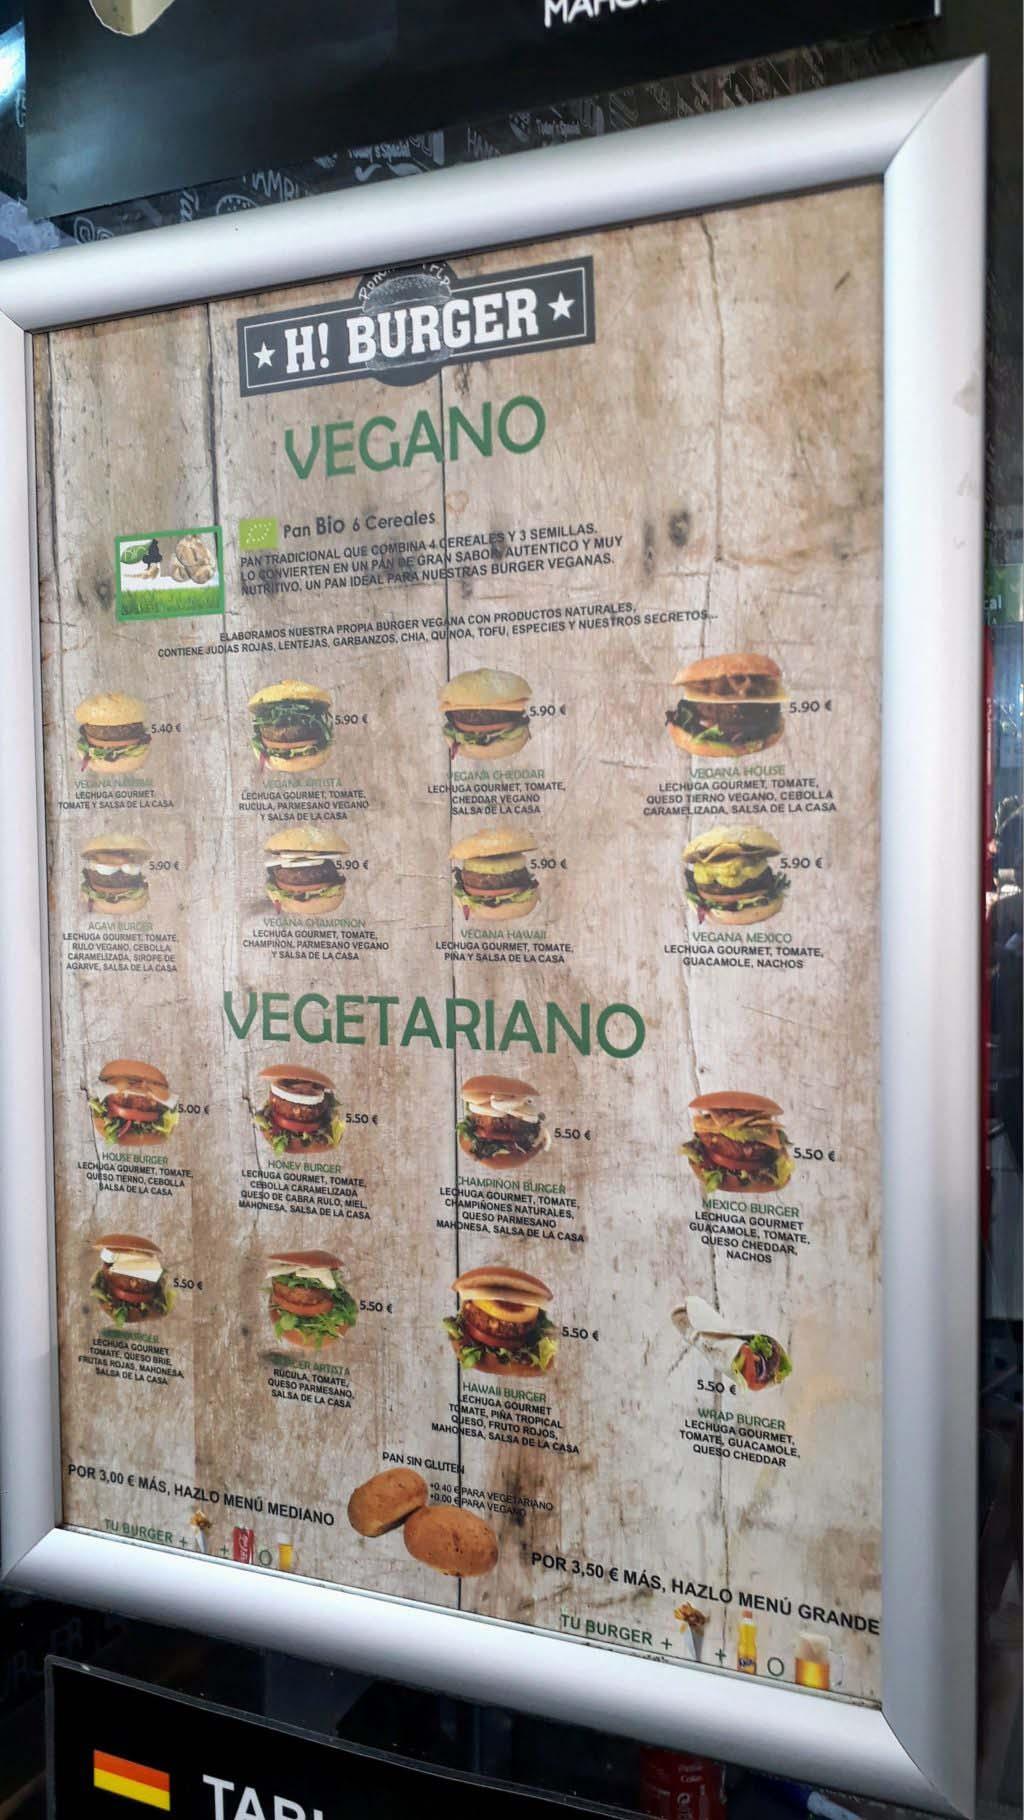 Vegan and Vegetarian Burgers at H! Burgers at Centro Comercial Las Terrazas